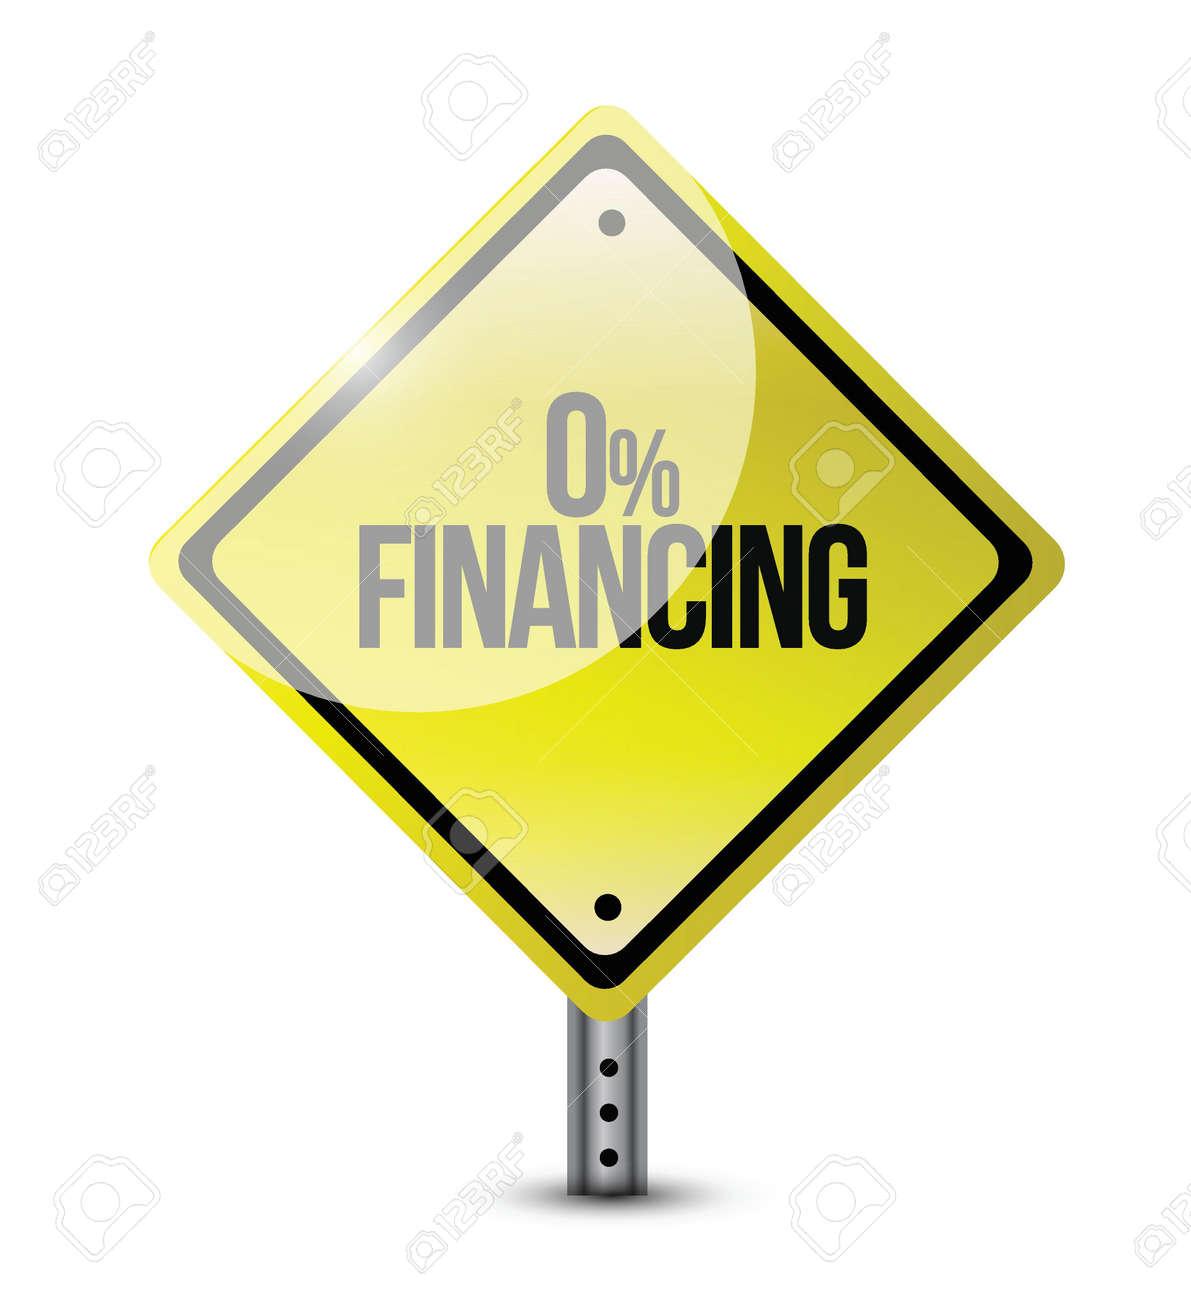 zero financing road sign illustration design over a white background - 22165811